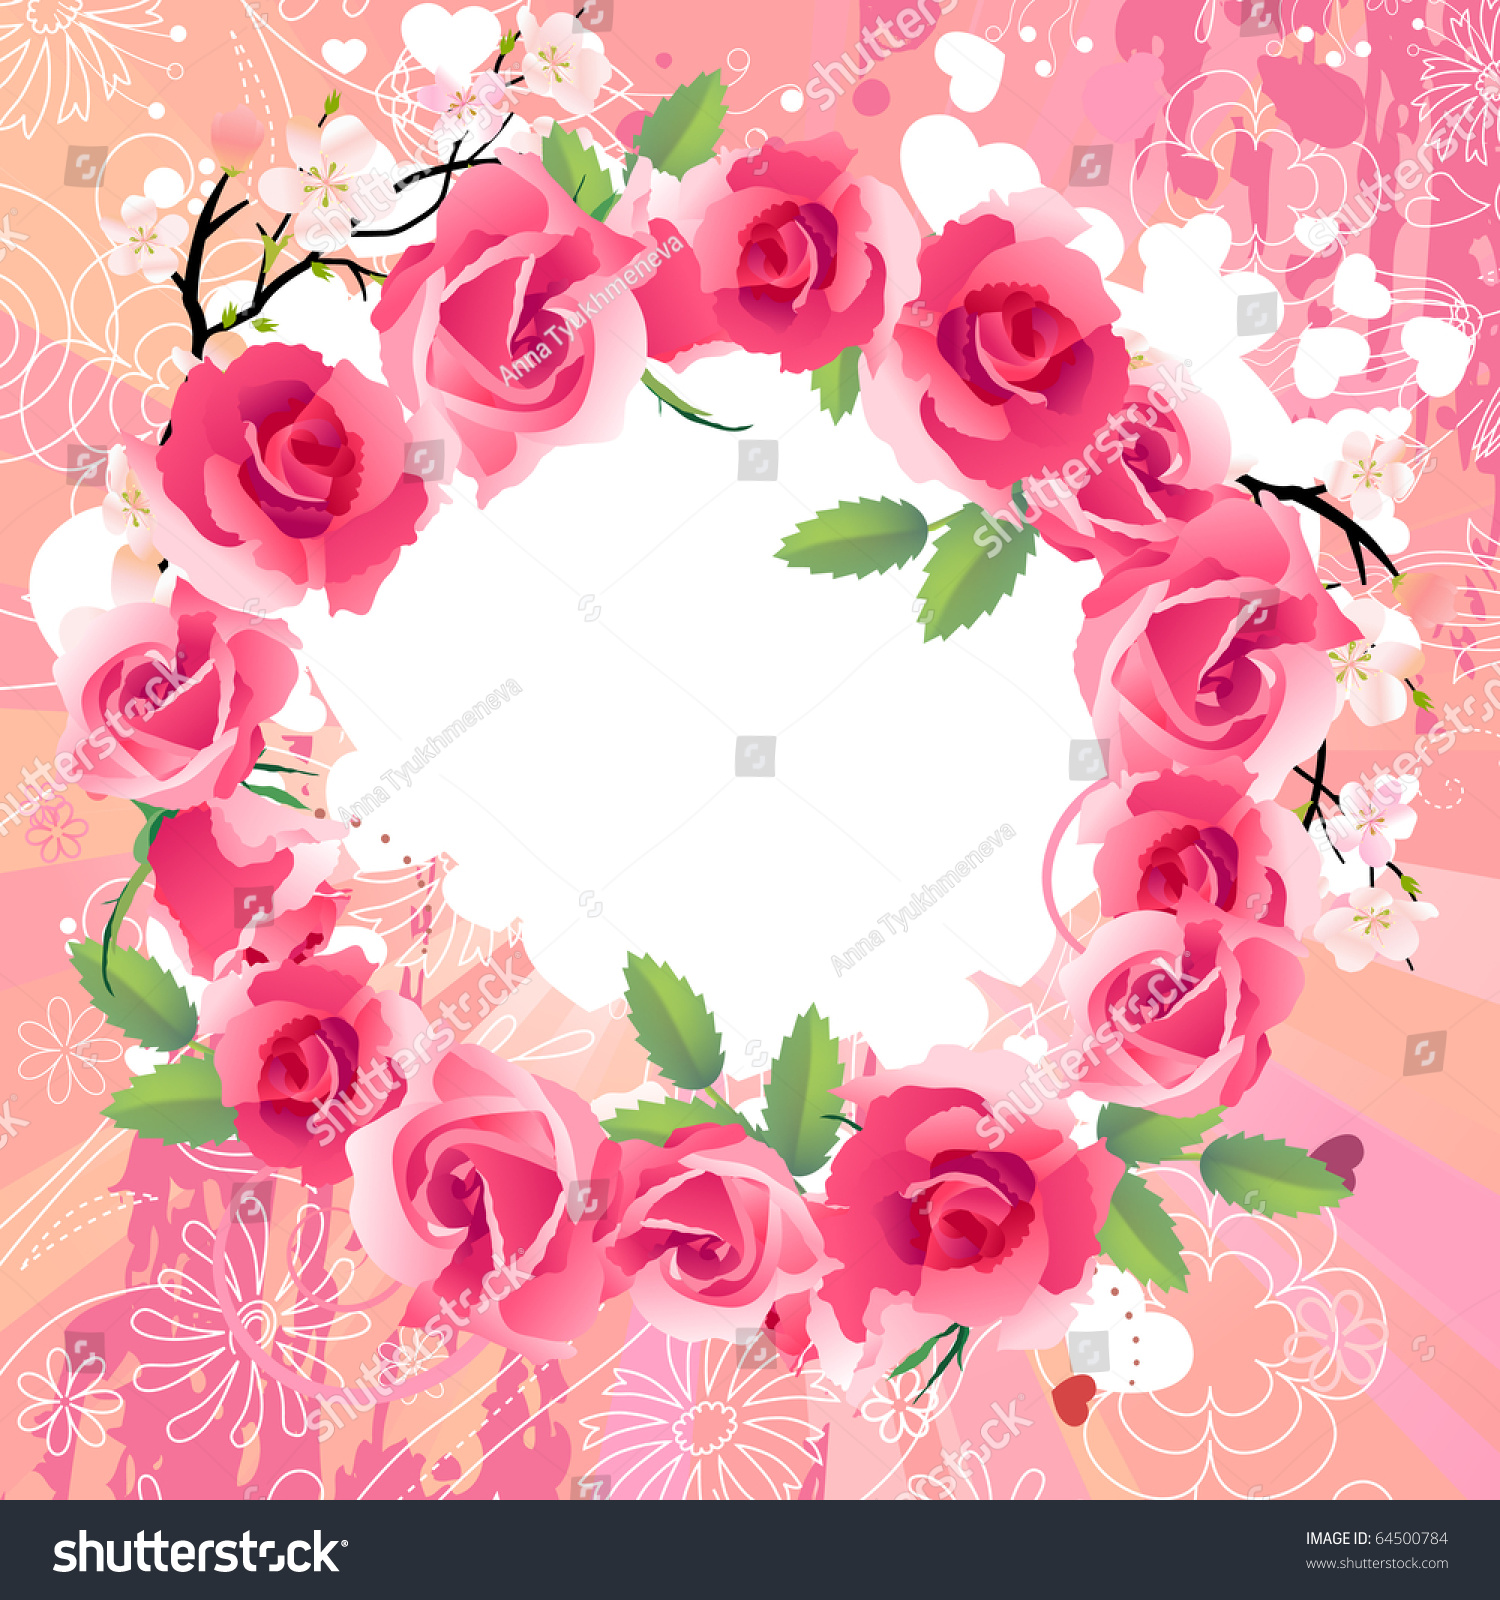 red rose wreath raster version vector lagerillustration, Beautiful flower